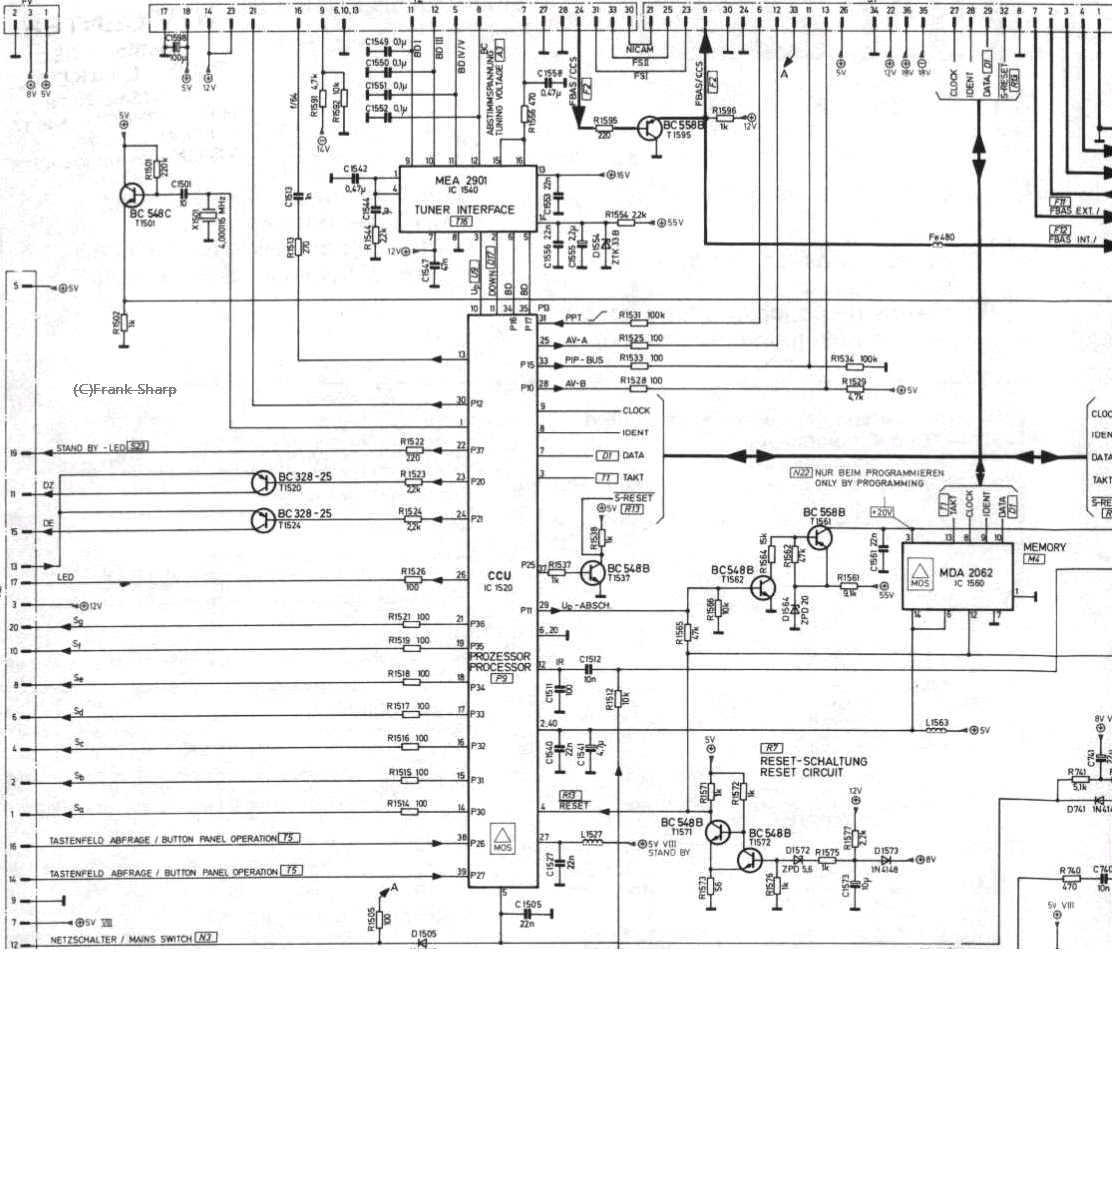 edenpure model 500 wiring diagram heat map diagram wiring edenpure heater model 1000 edenpure heater on sale [ 1112 x 1200 Pixel ]